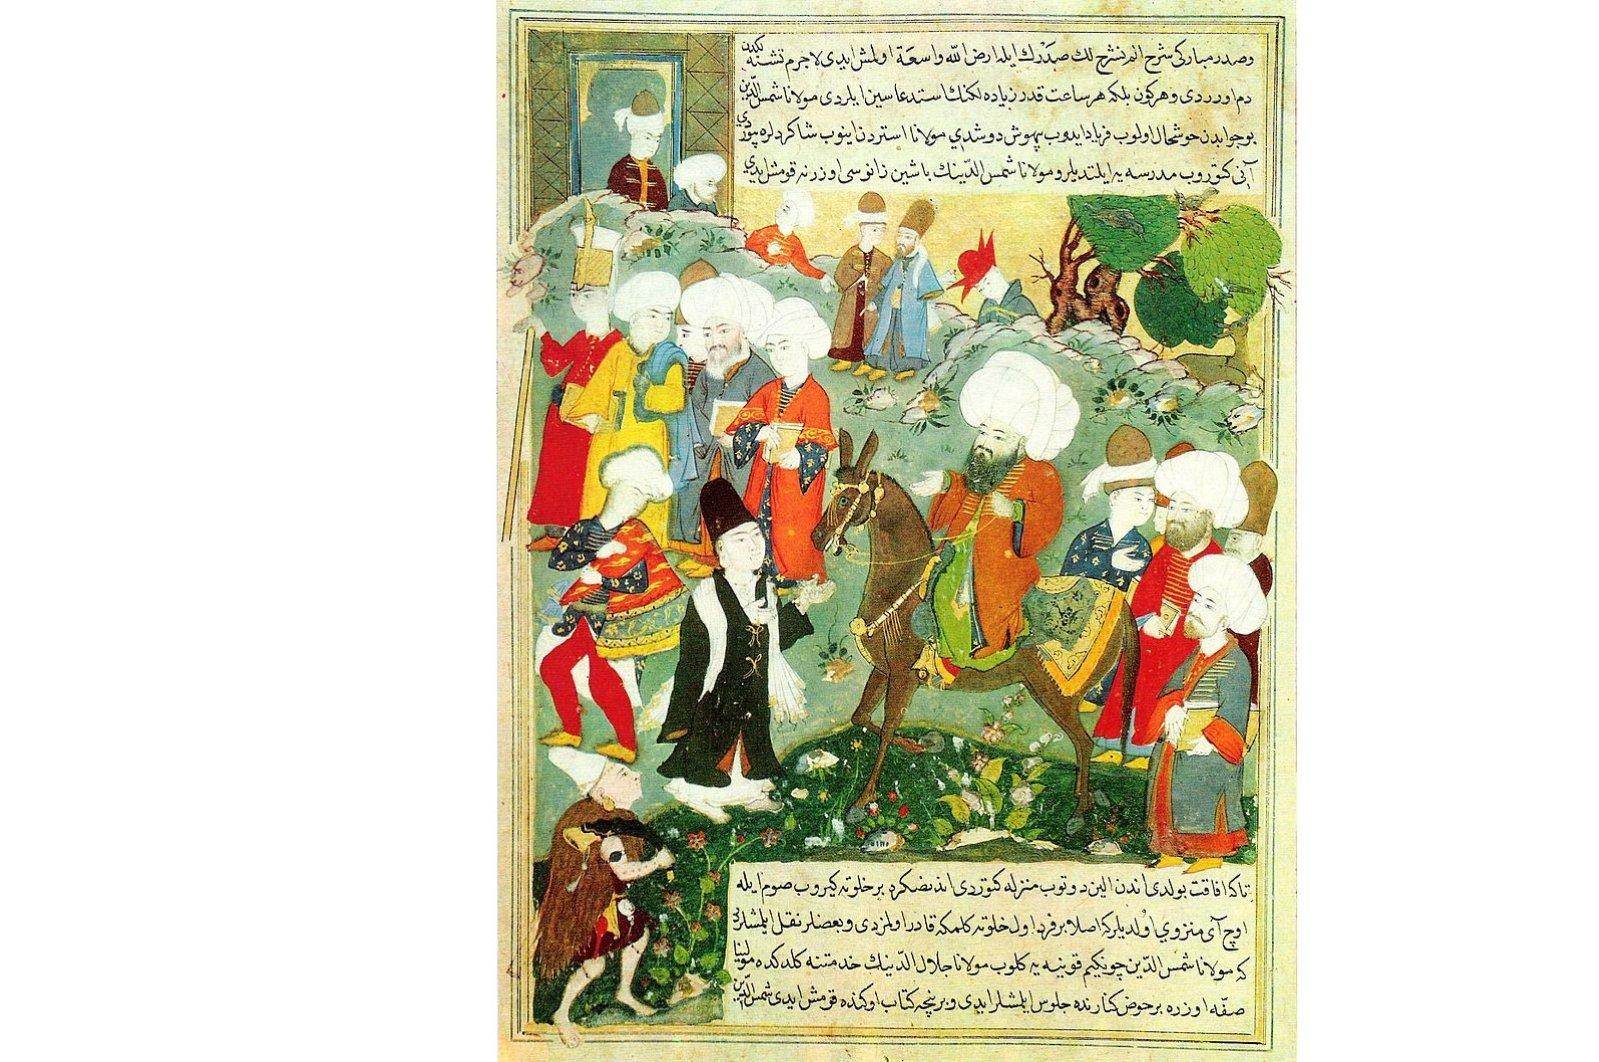 An Ottoman-era miniature depicts Mevlana Jalaluddin Rumi on horseback and Persian poet Shams-e Tabrizi in front of him.